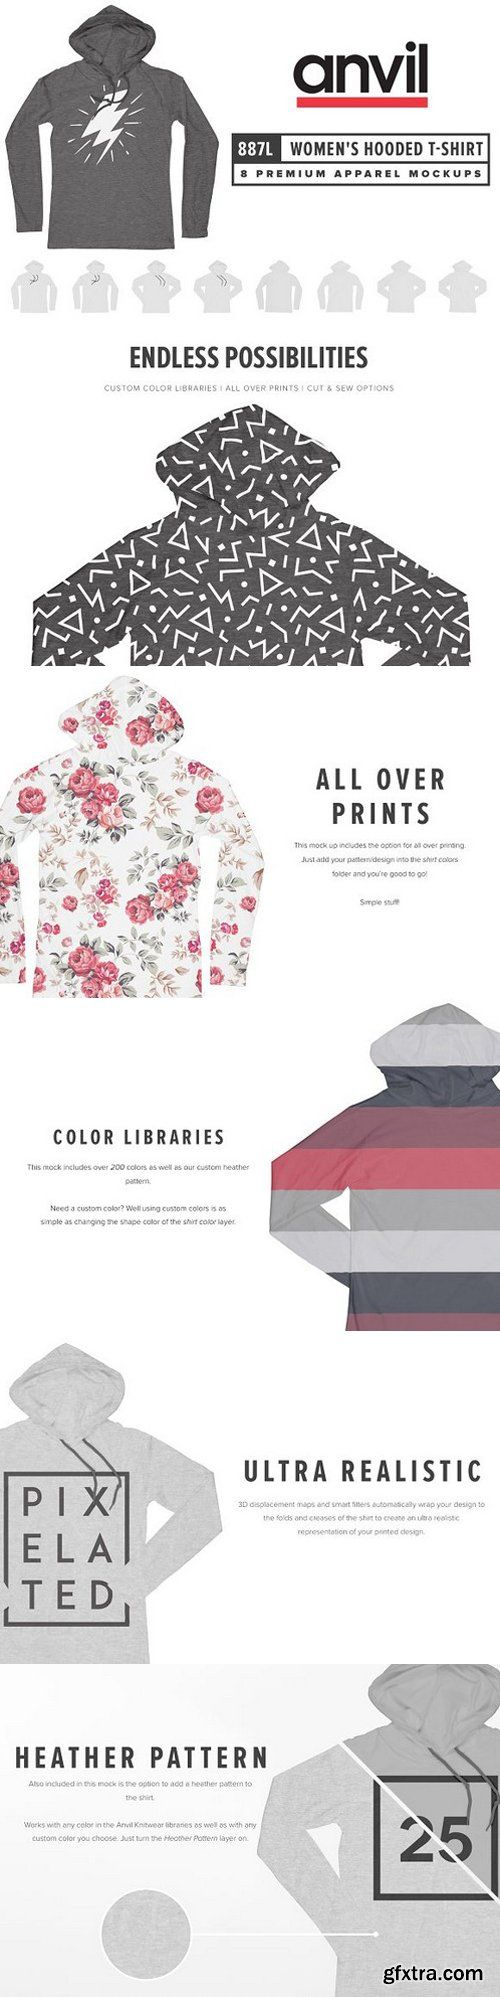 CM - Anvil 887L Women's LS Hooded T-Shirt 1616909